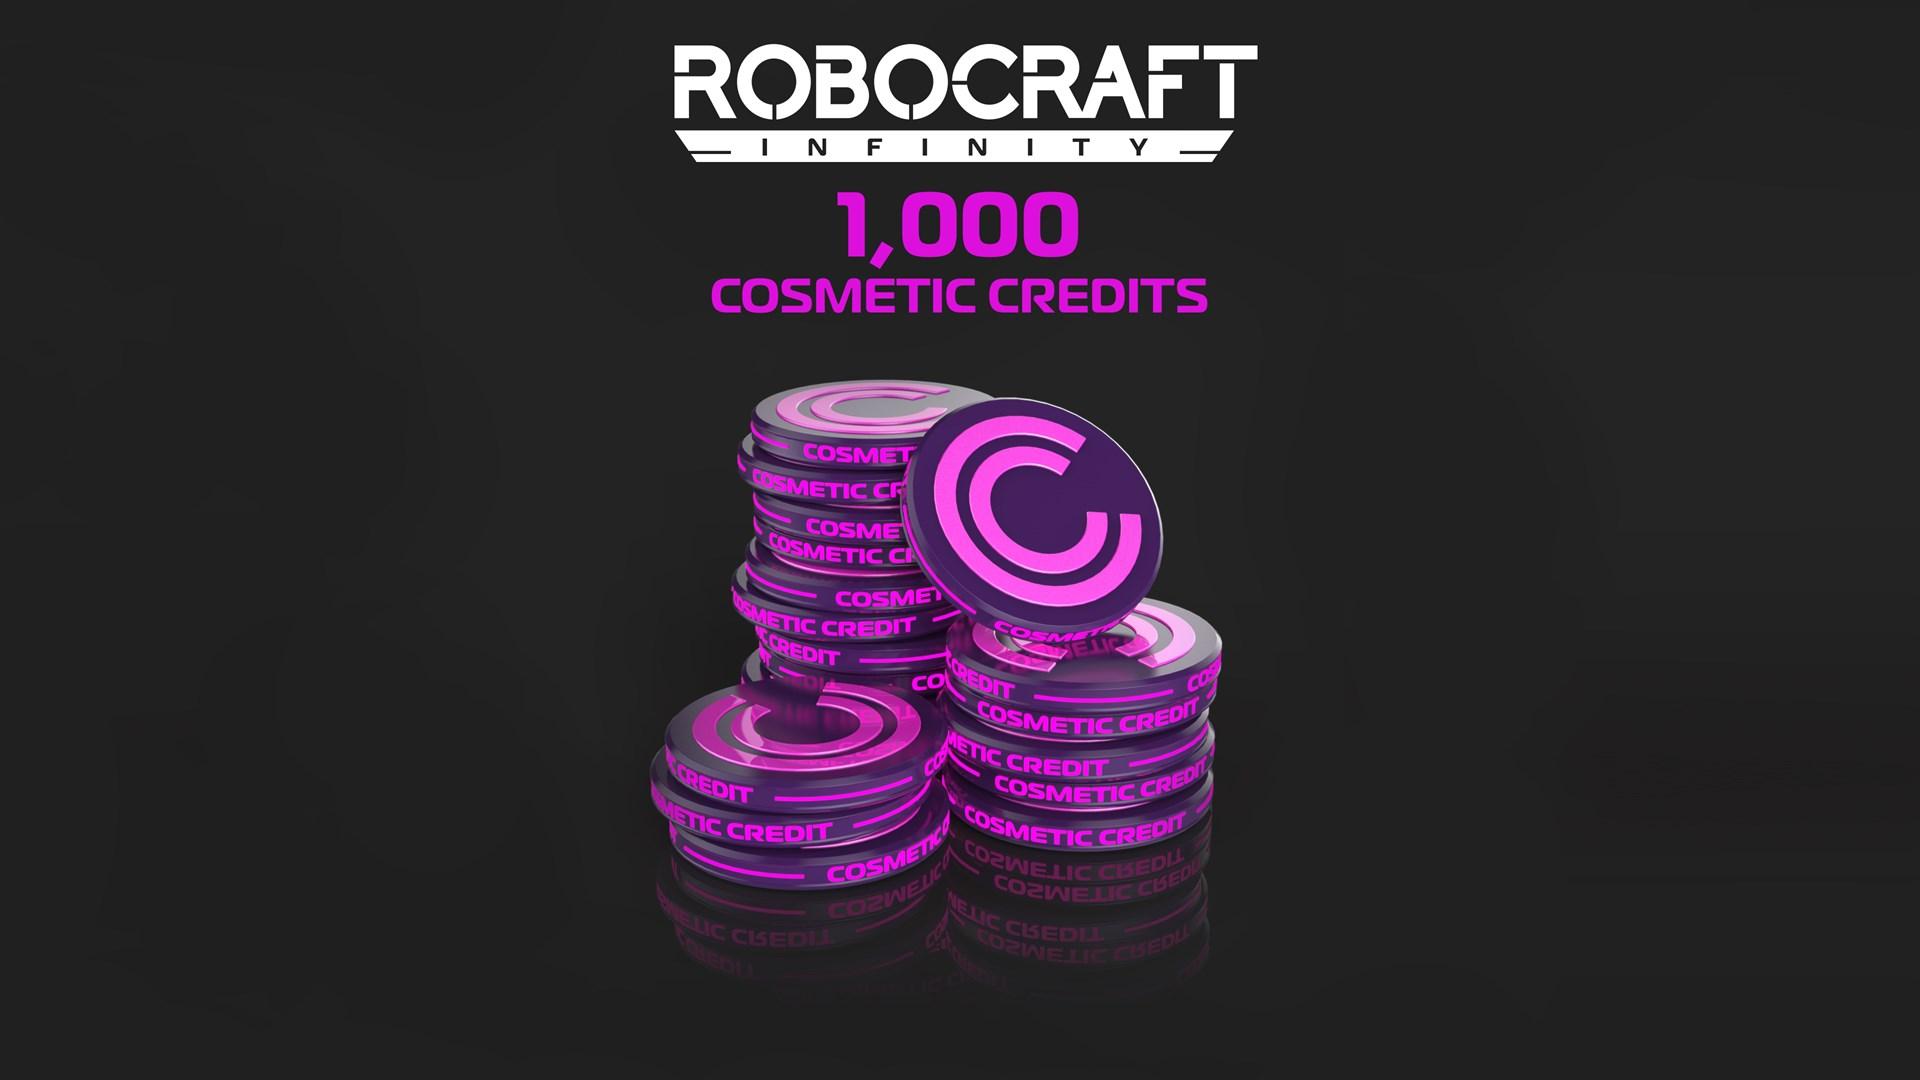 1,000 Cosmetic Credits